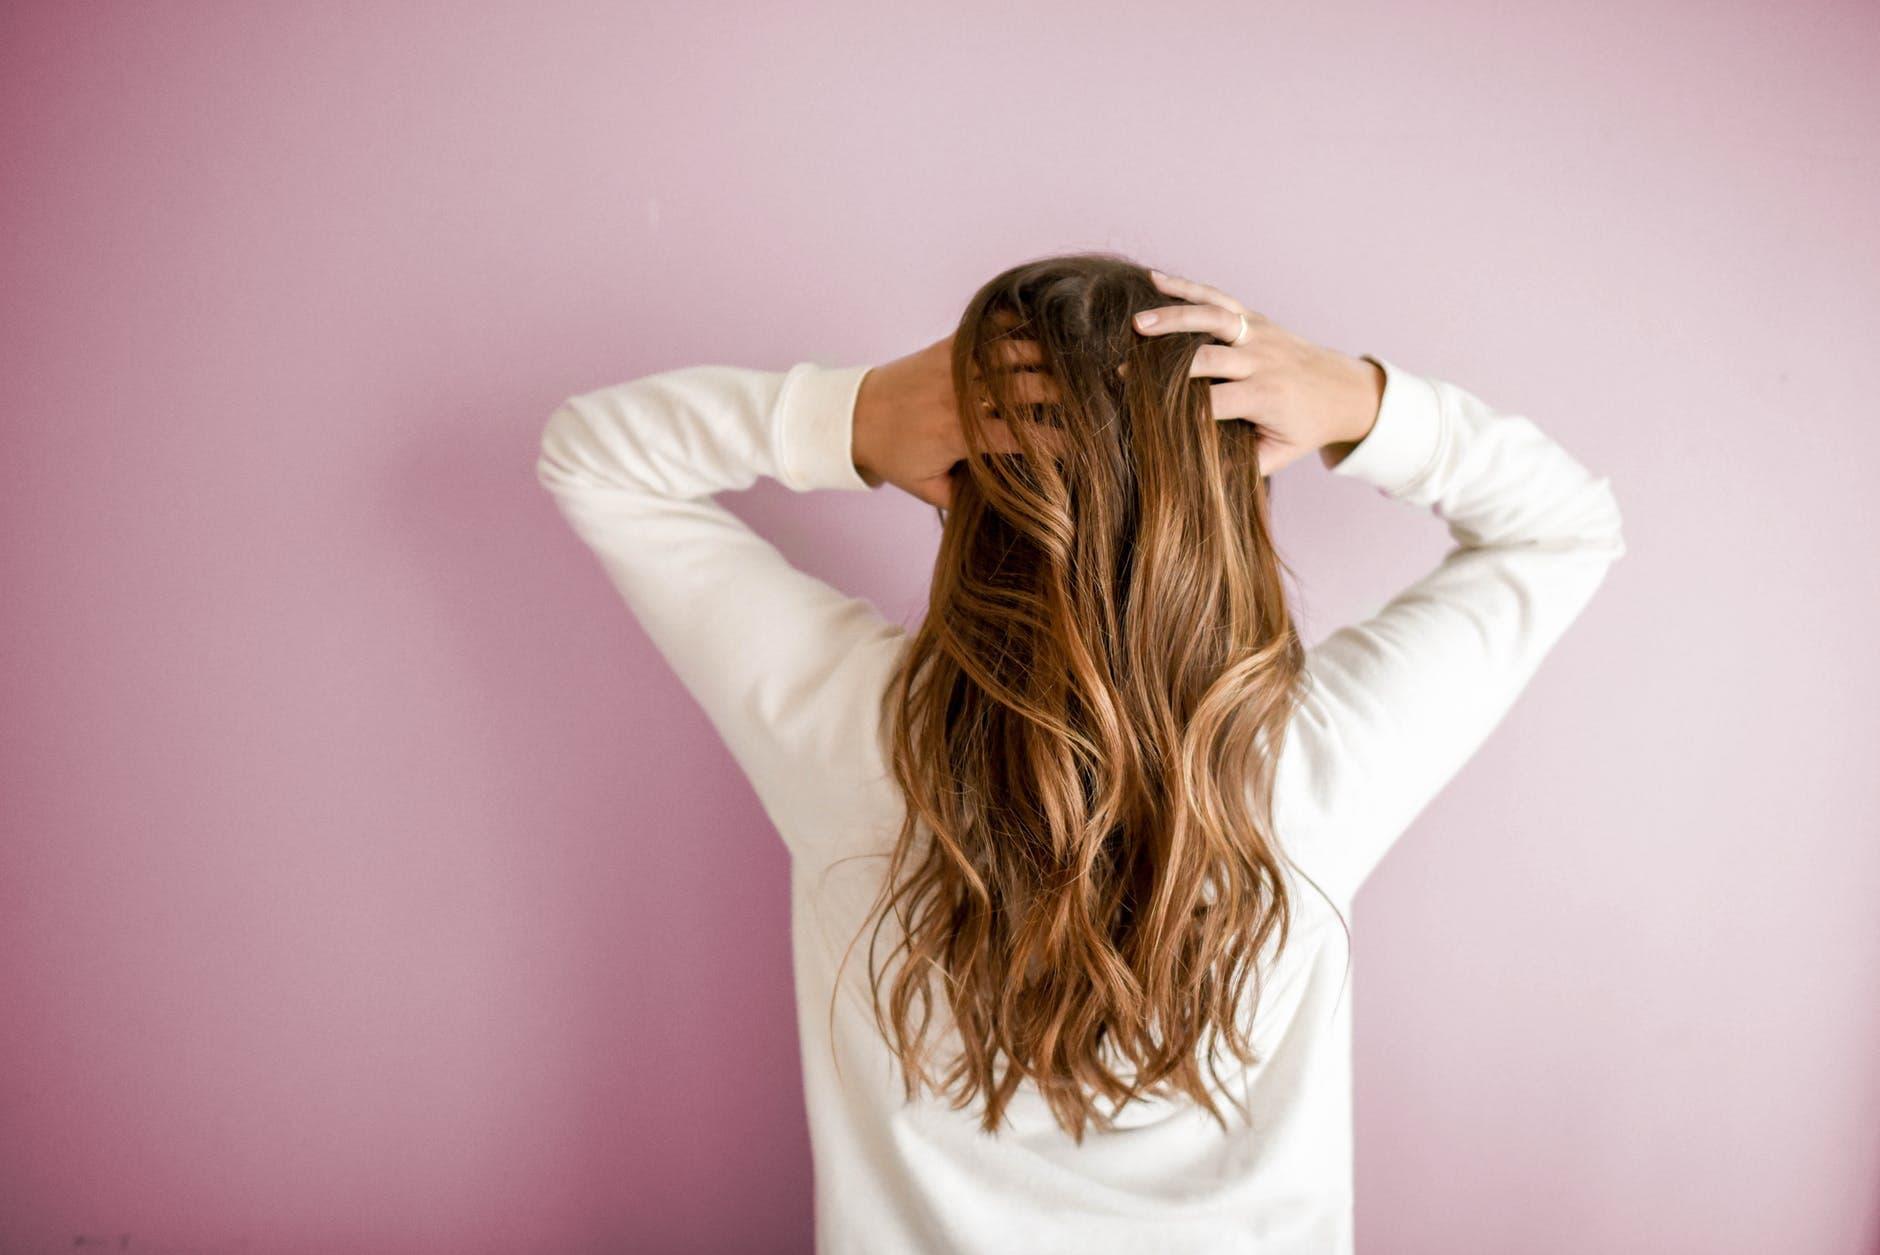 Hair Fibers Work Better to Get Hair Back